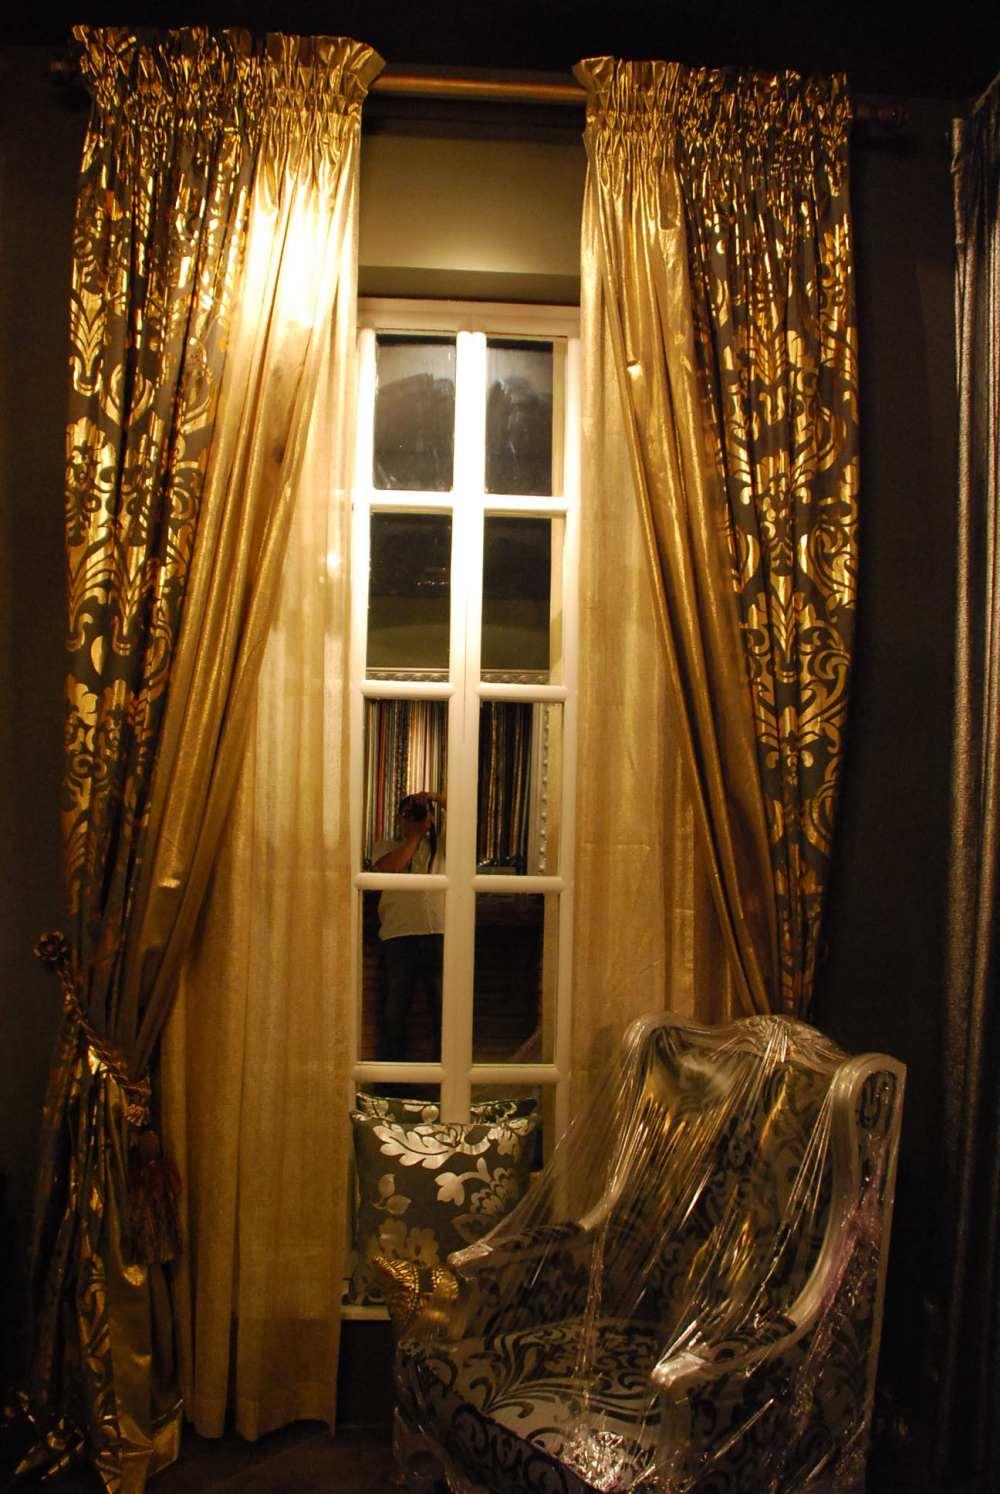 Aiden 收藏窗帘图片高清图(用方案里很清晰。)免费~_07.JPG